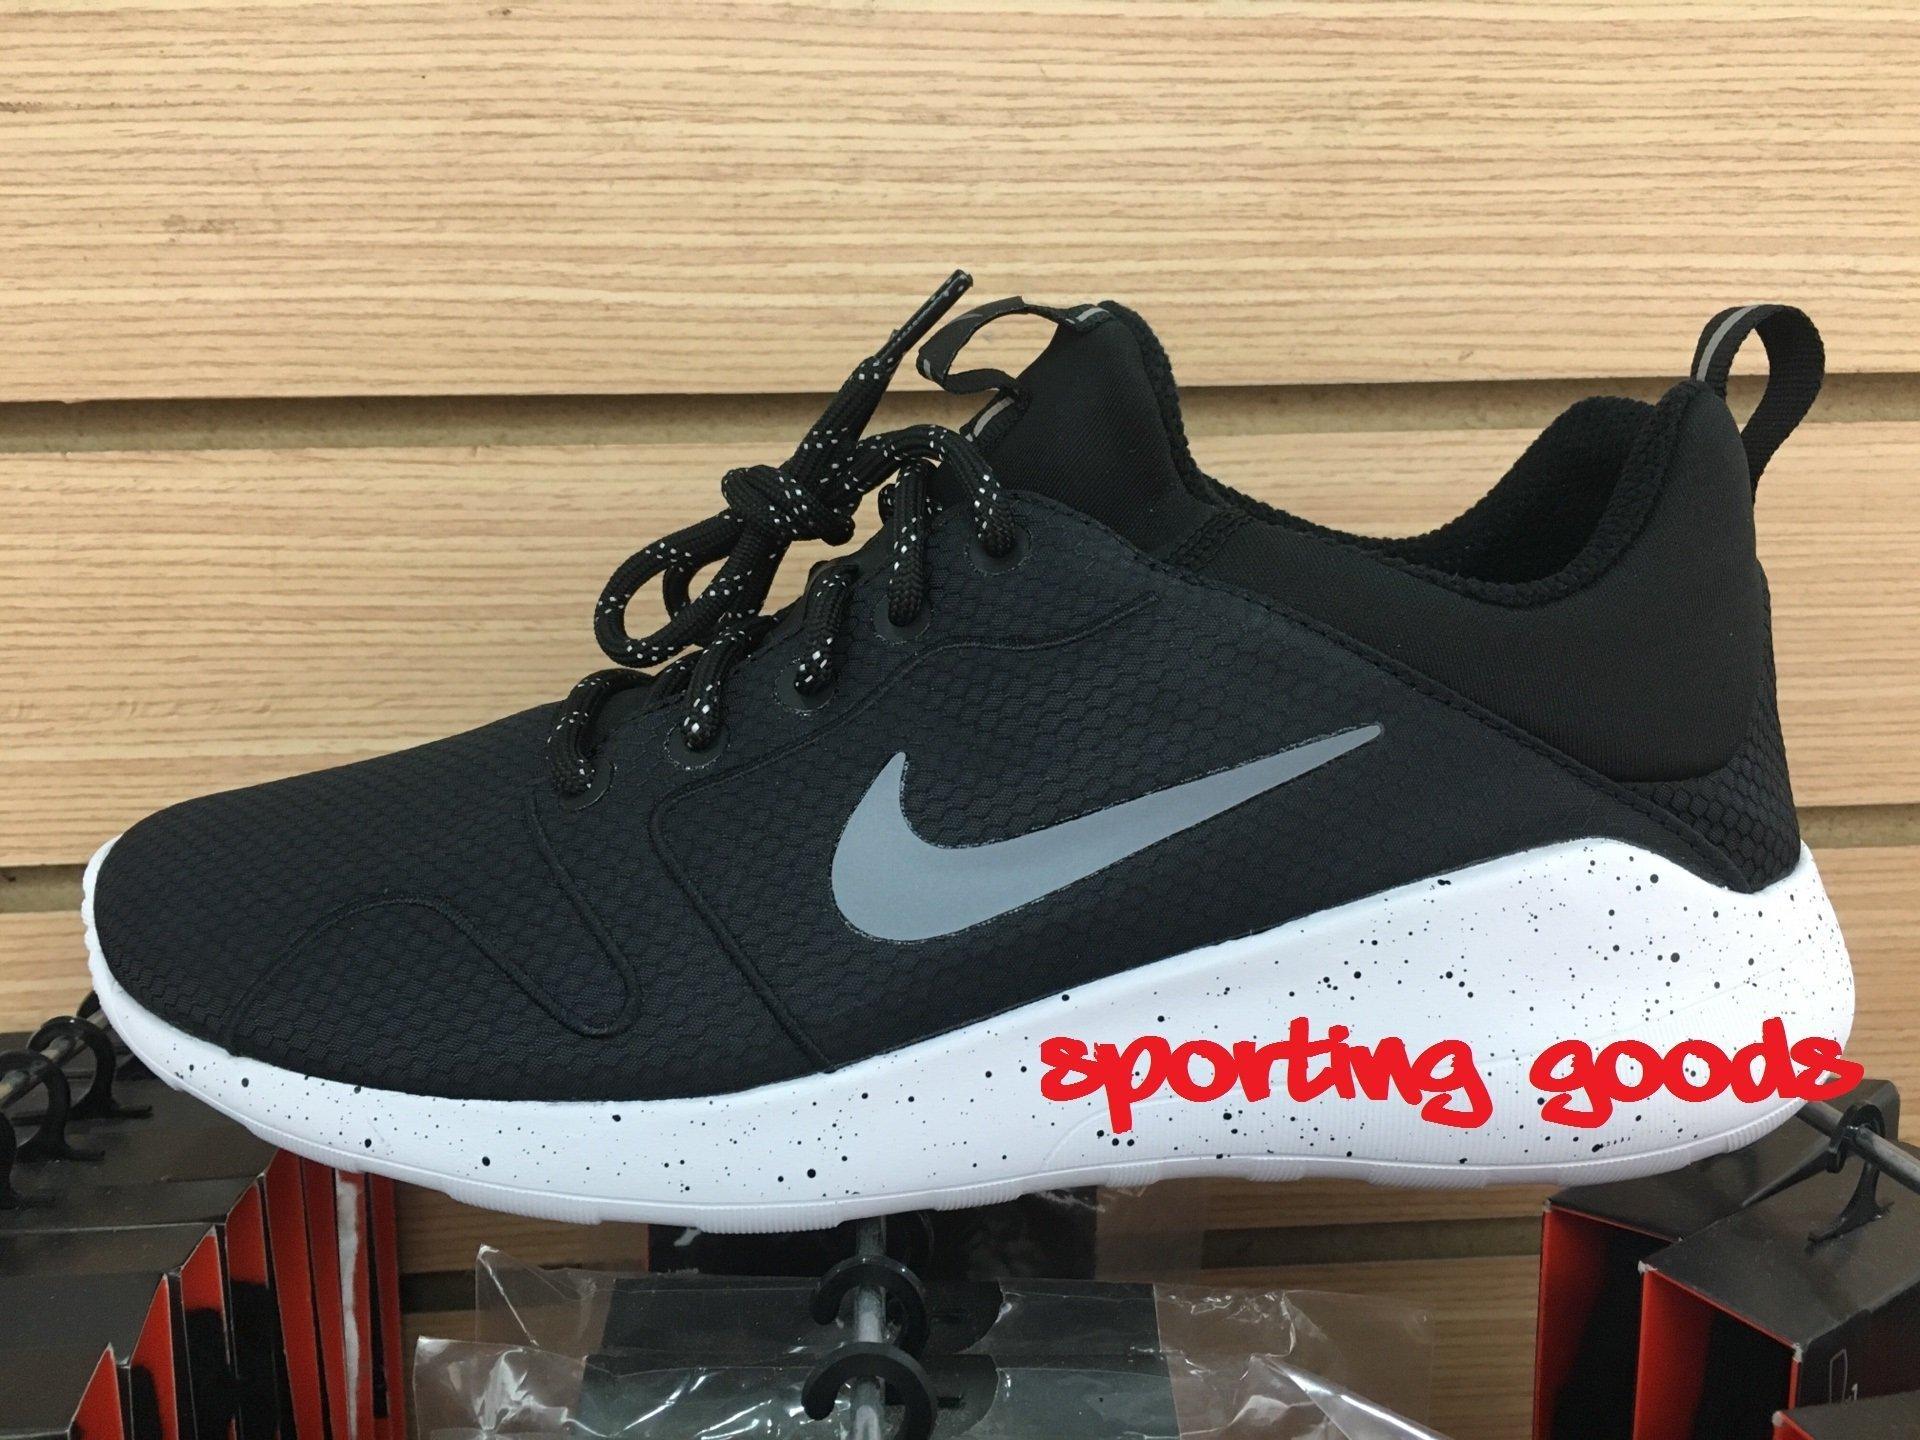 S.G NIKE KAISHI 2.0 SE 黑 白 潑墨 反光 透氣 輕量 復古 慢跑鞋 情侶鞋 844838-003